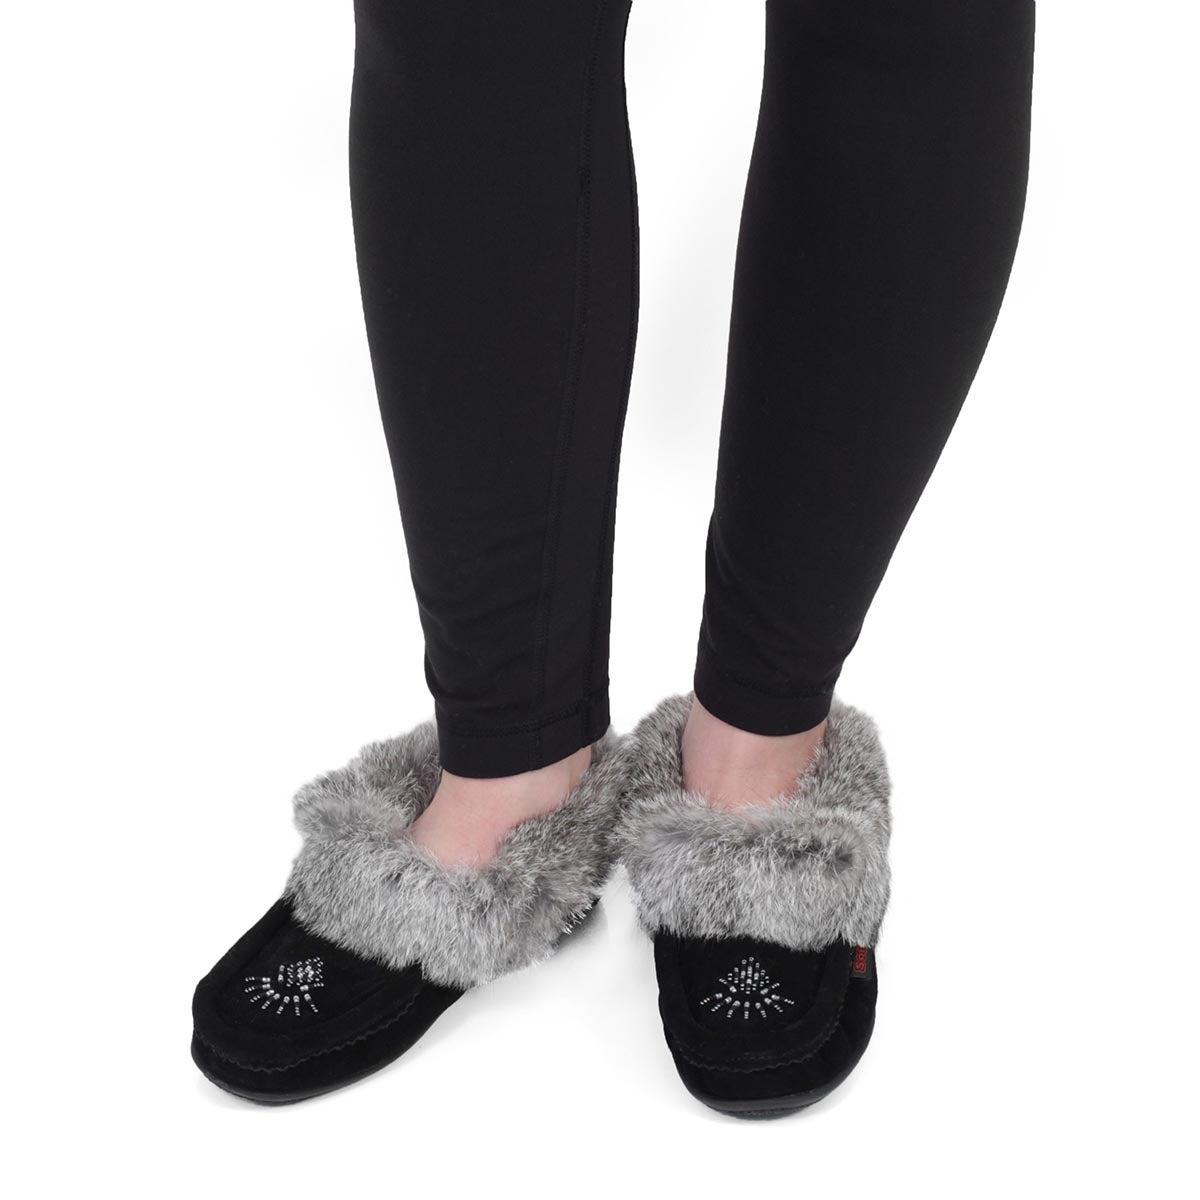 Lds Cute 4 blk/gry rabbit fur moccasin